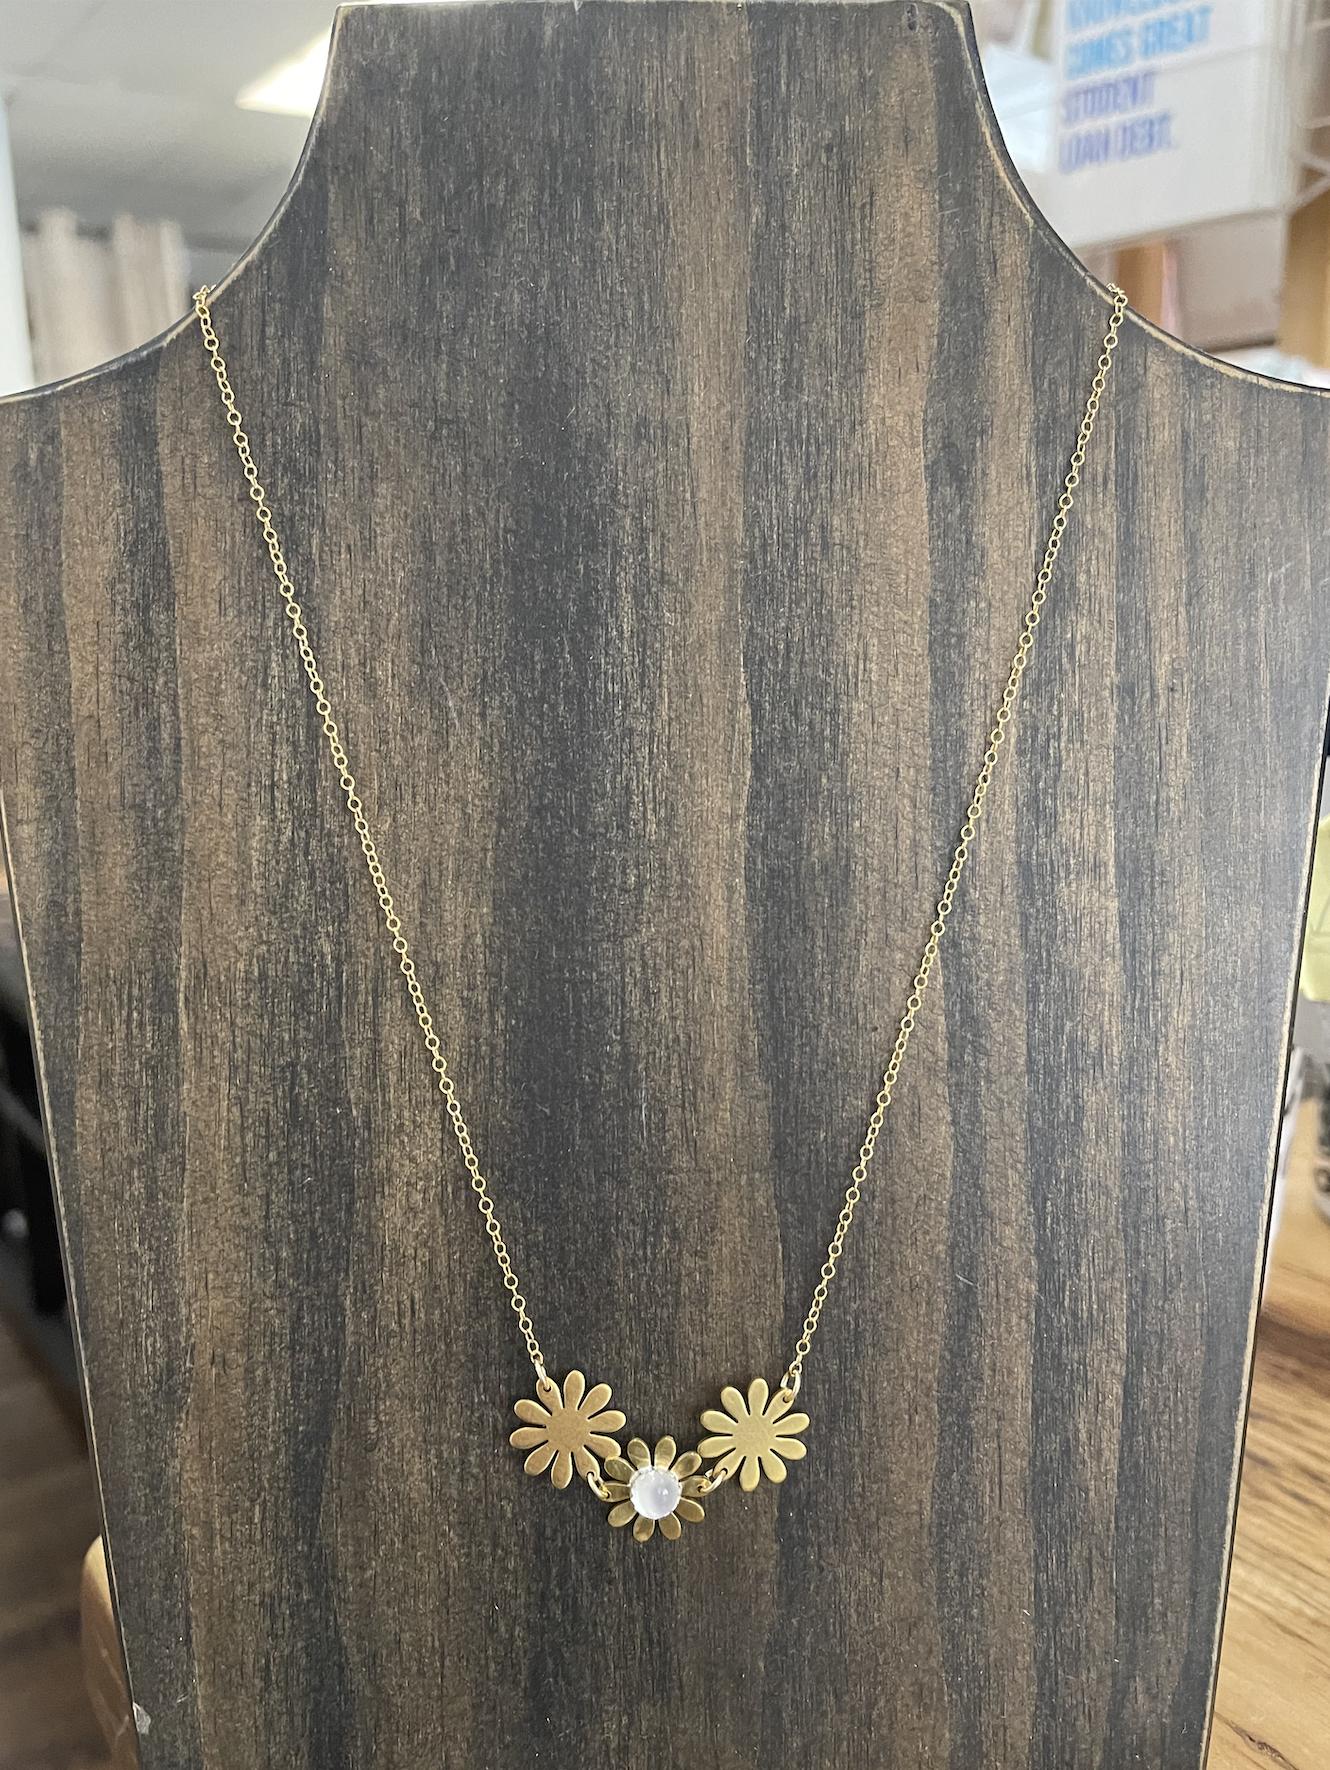 Metrix Jewelry Brigitte Necklace- Moonstone